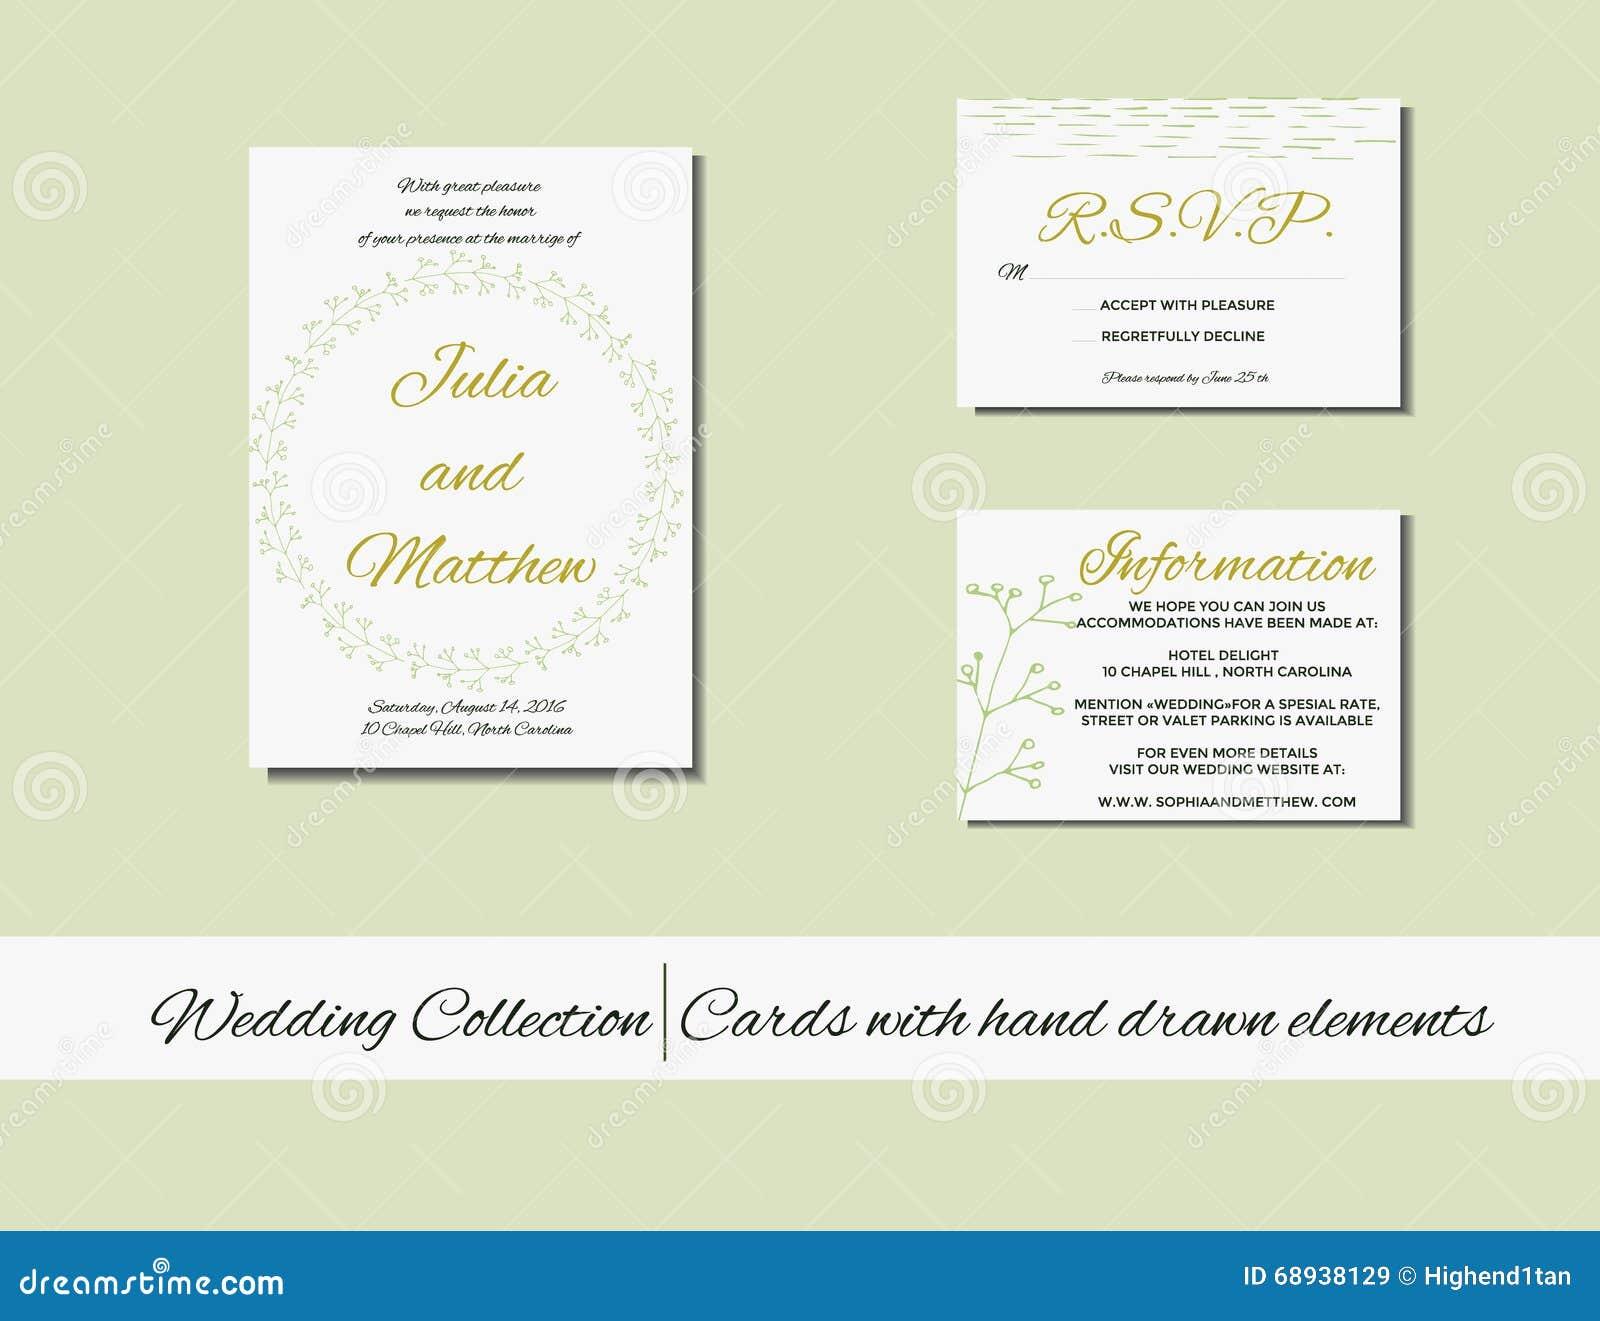 Unique set of wedding invitation cards with hand drawn elements download unique set of wedding invitation cards with hand drawn elements stock vector illustration stopboris Gallery